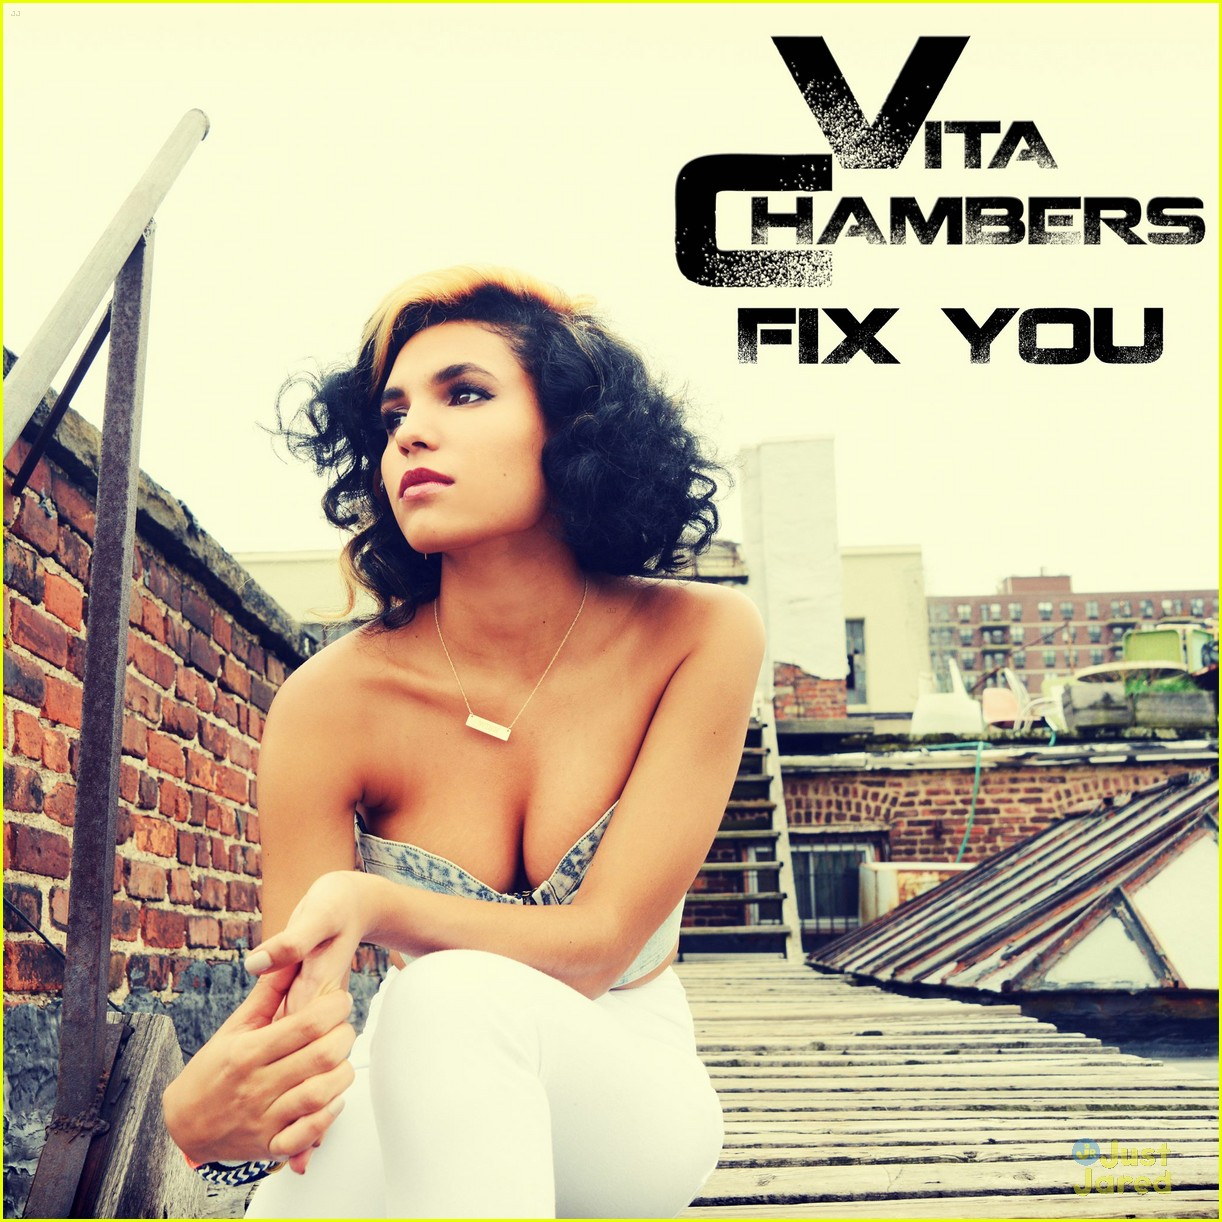 vita chambers fix you 01